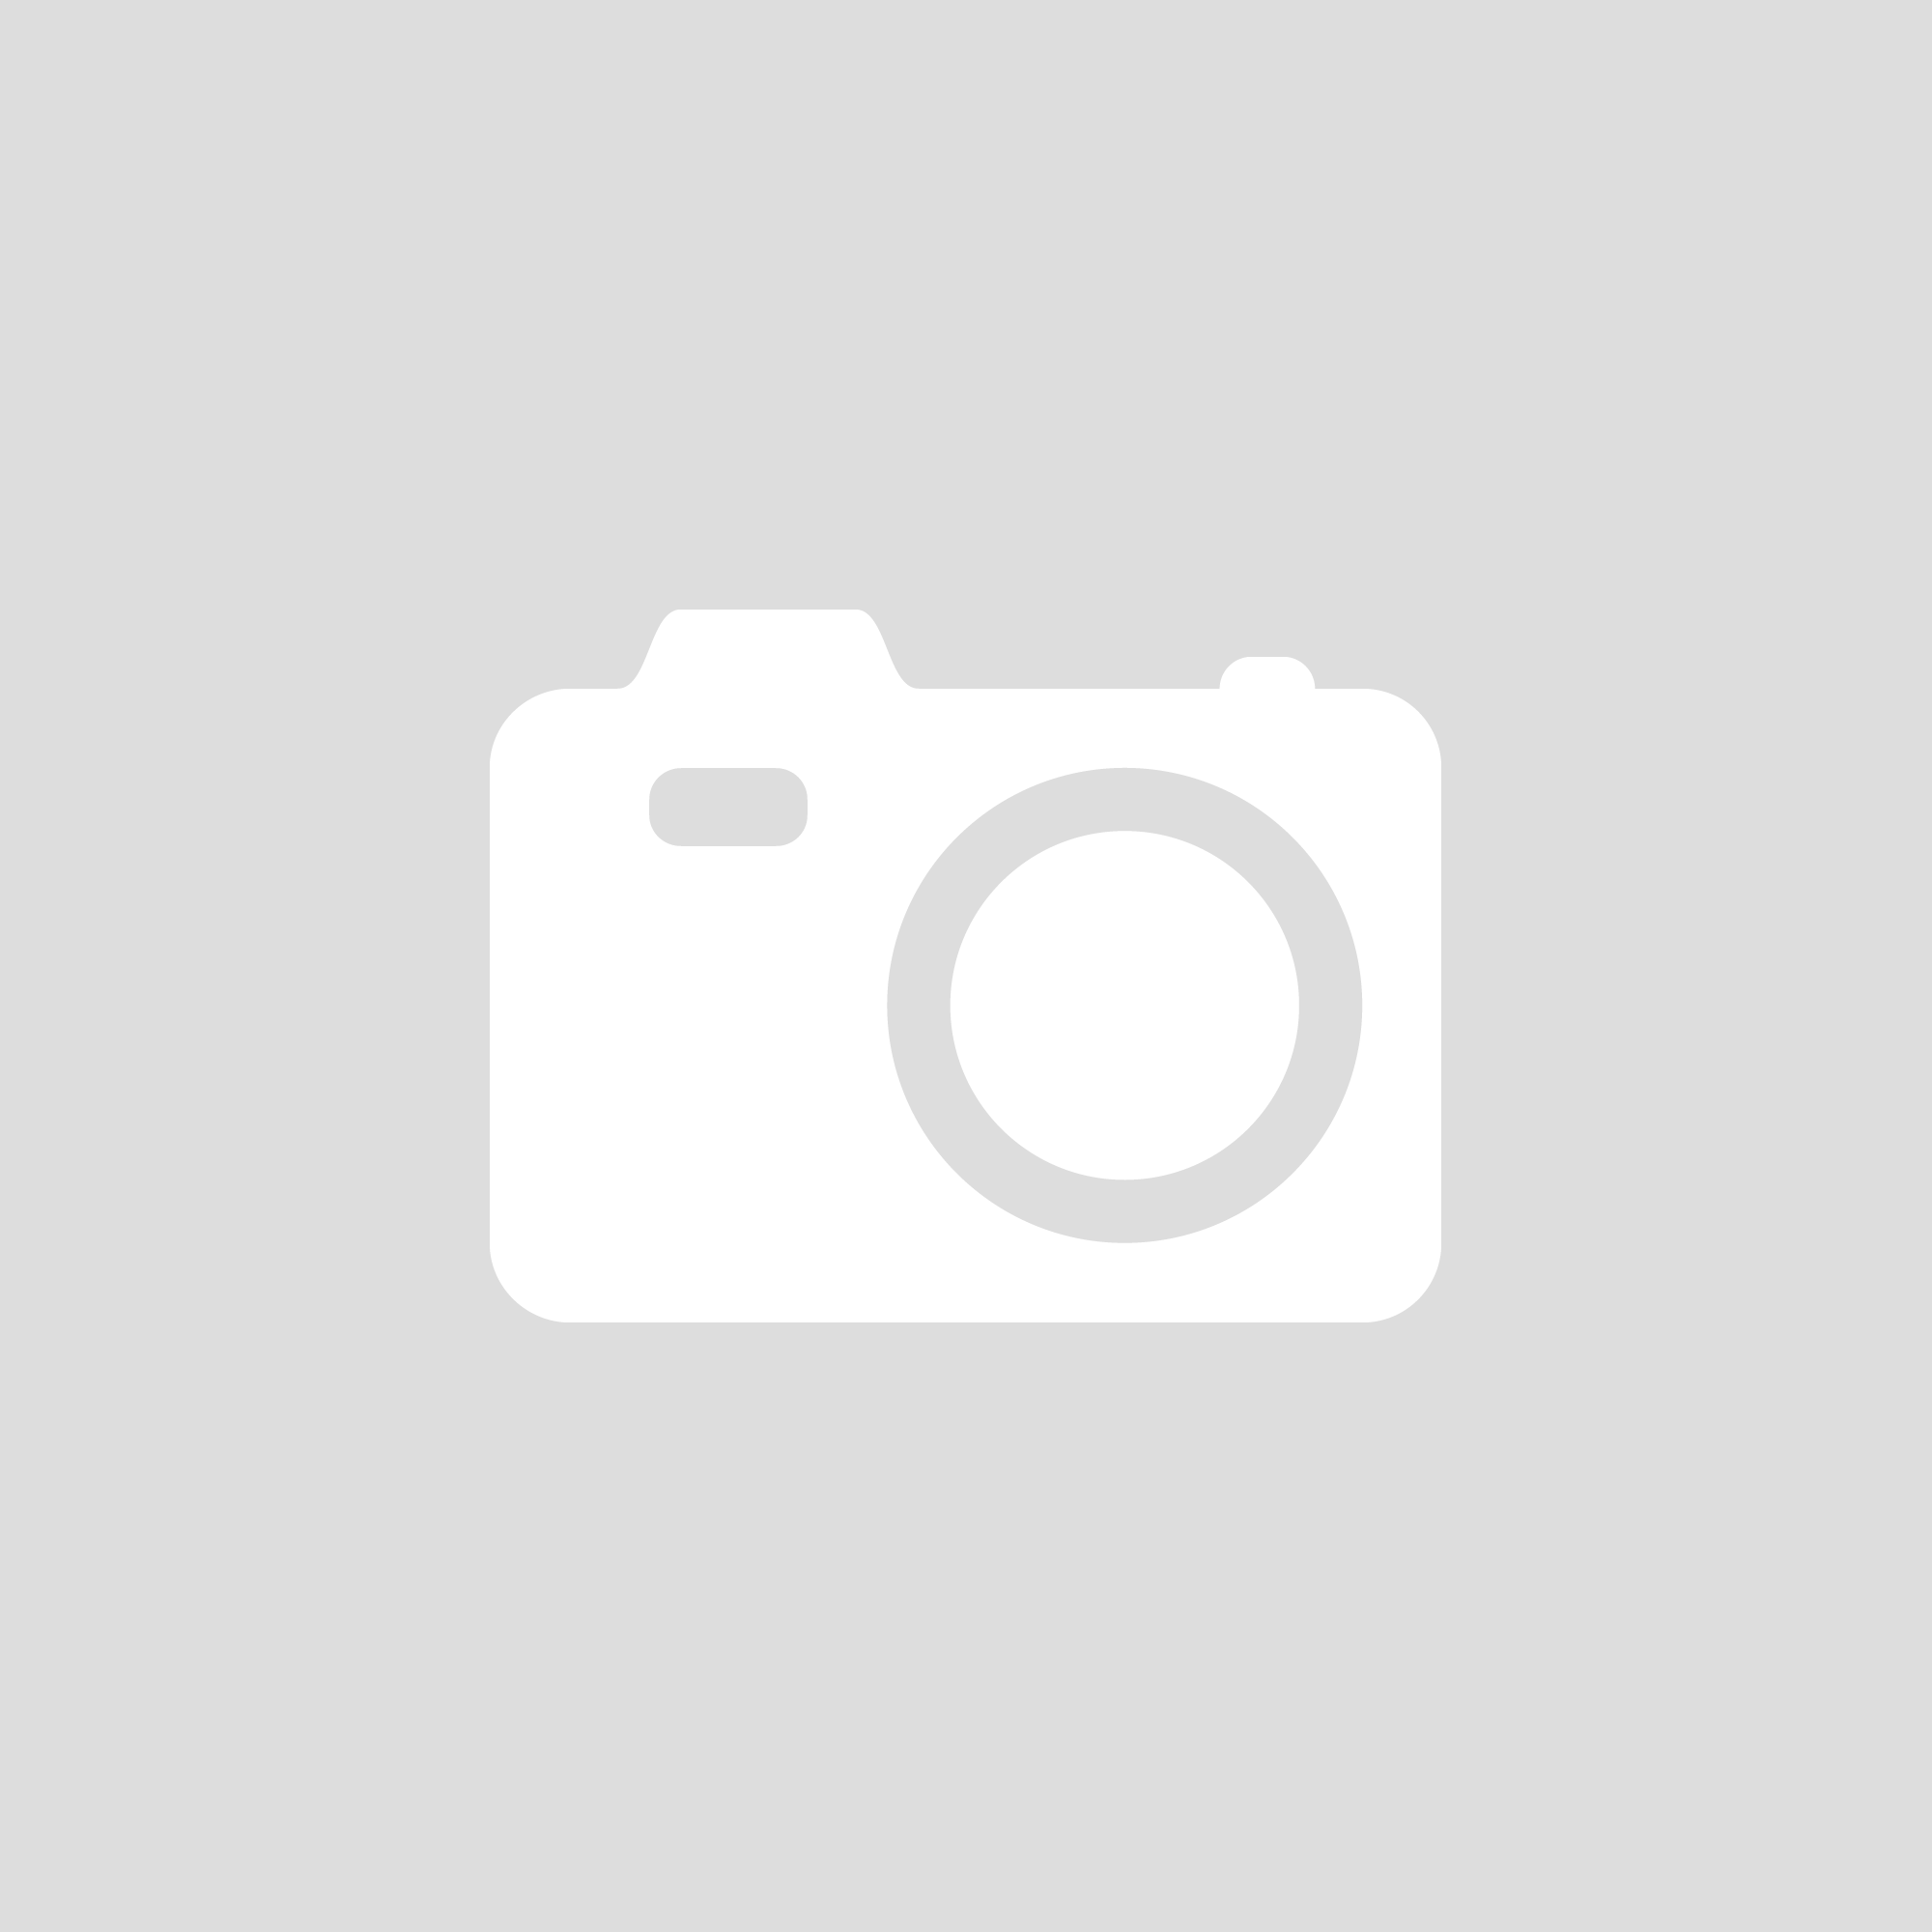 Lace Rose Plain Cream Wallpaper by Seriano GB 65009